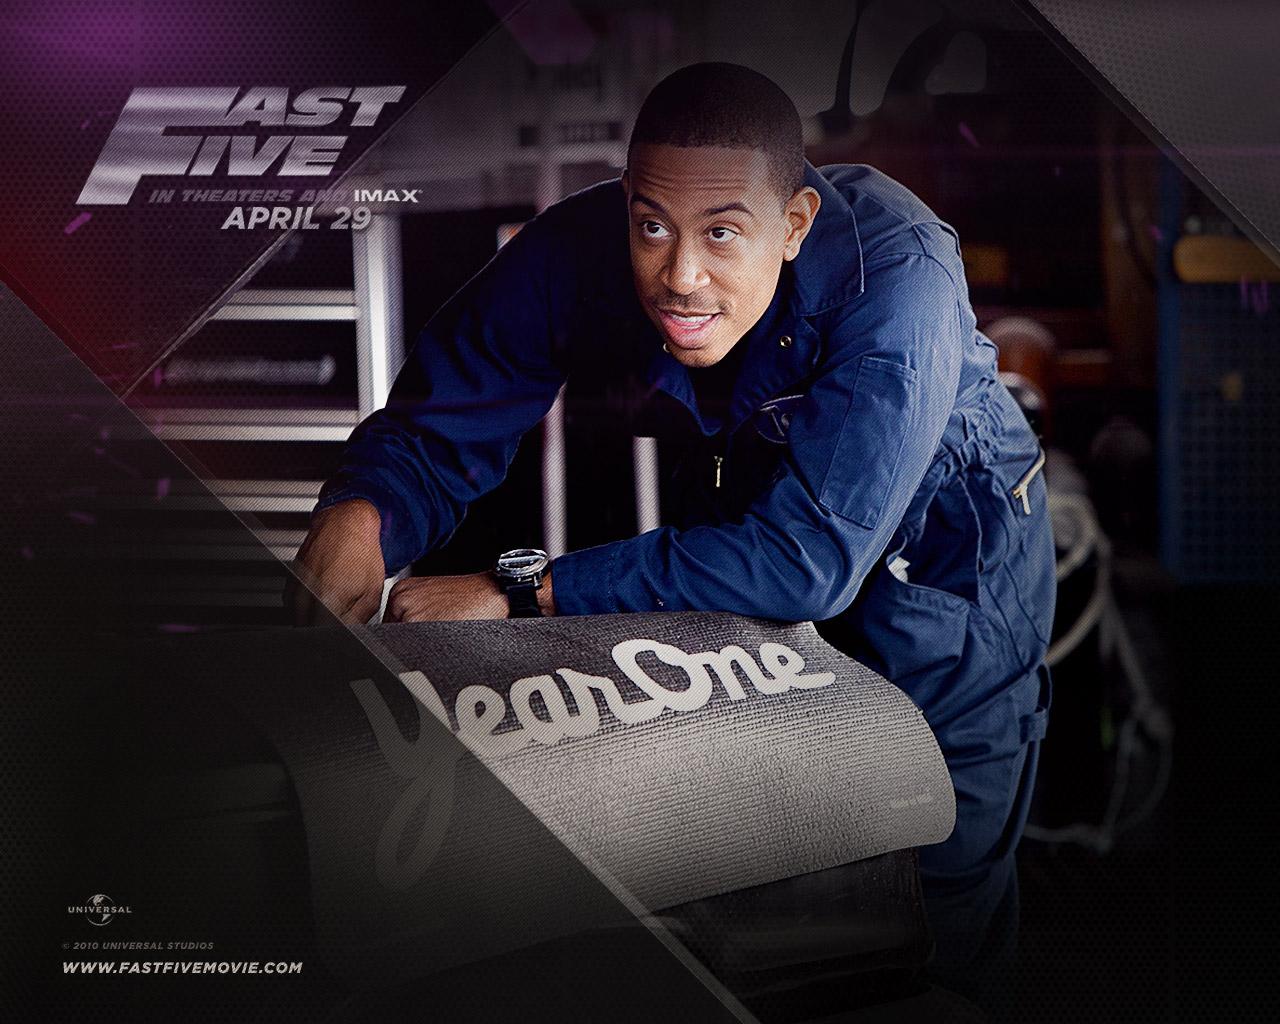 fast five ludacris. Ludacris in Fast Five